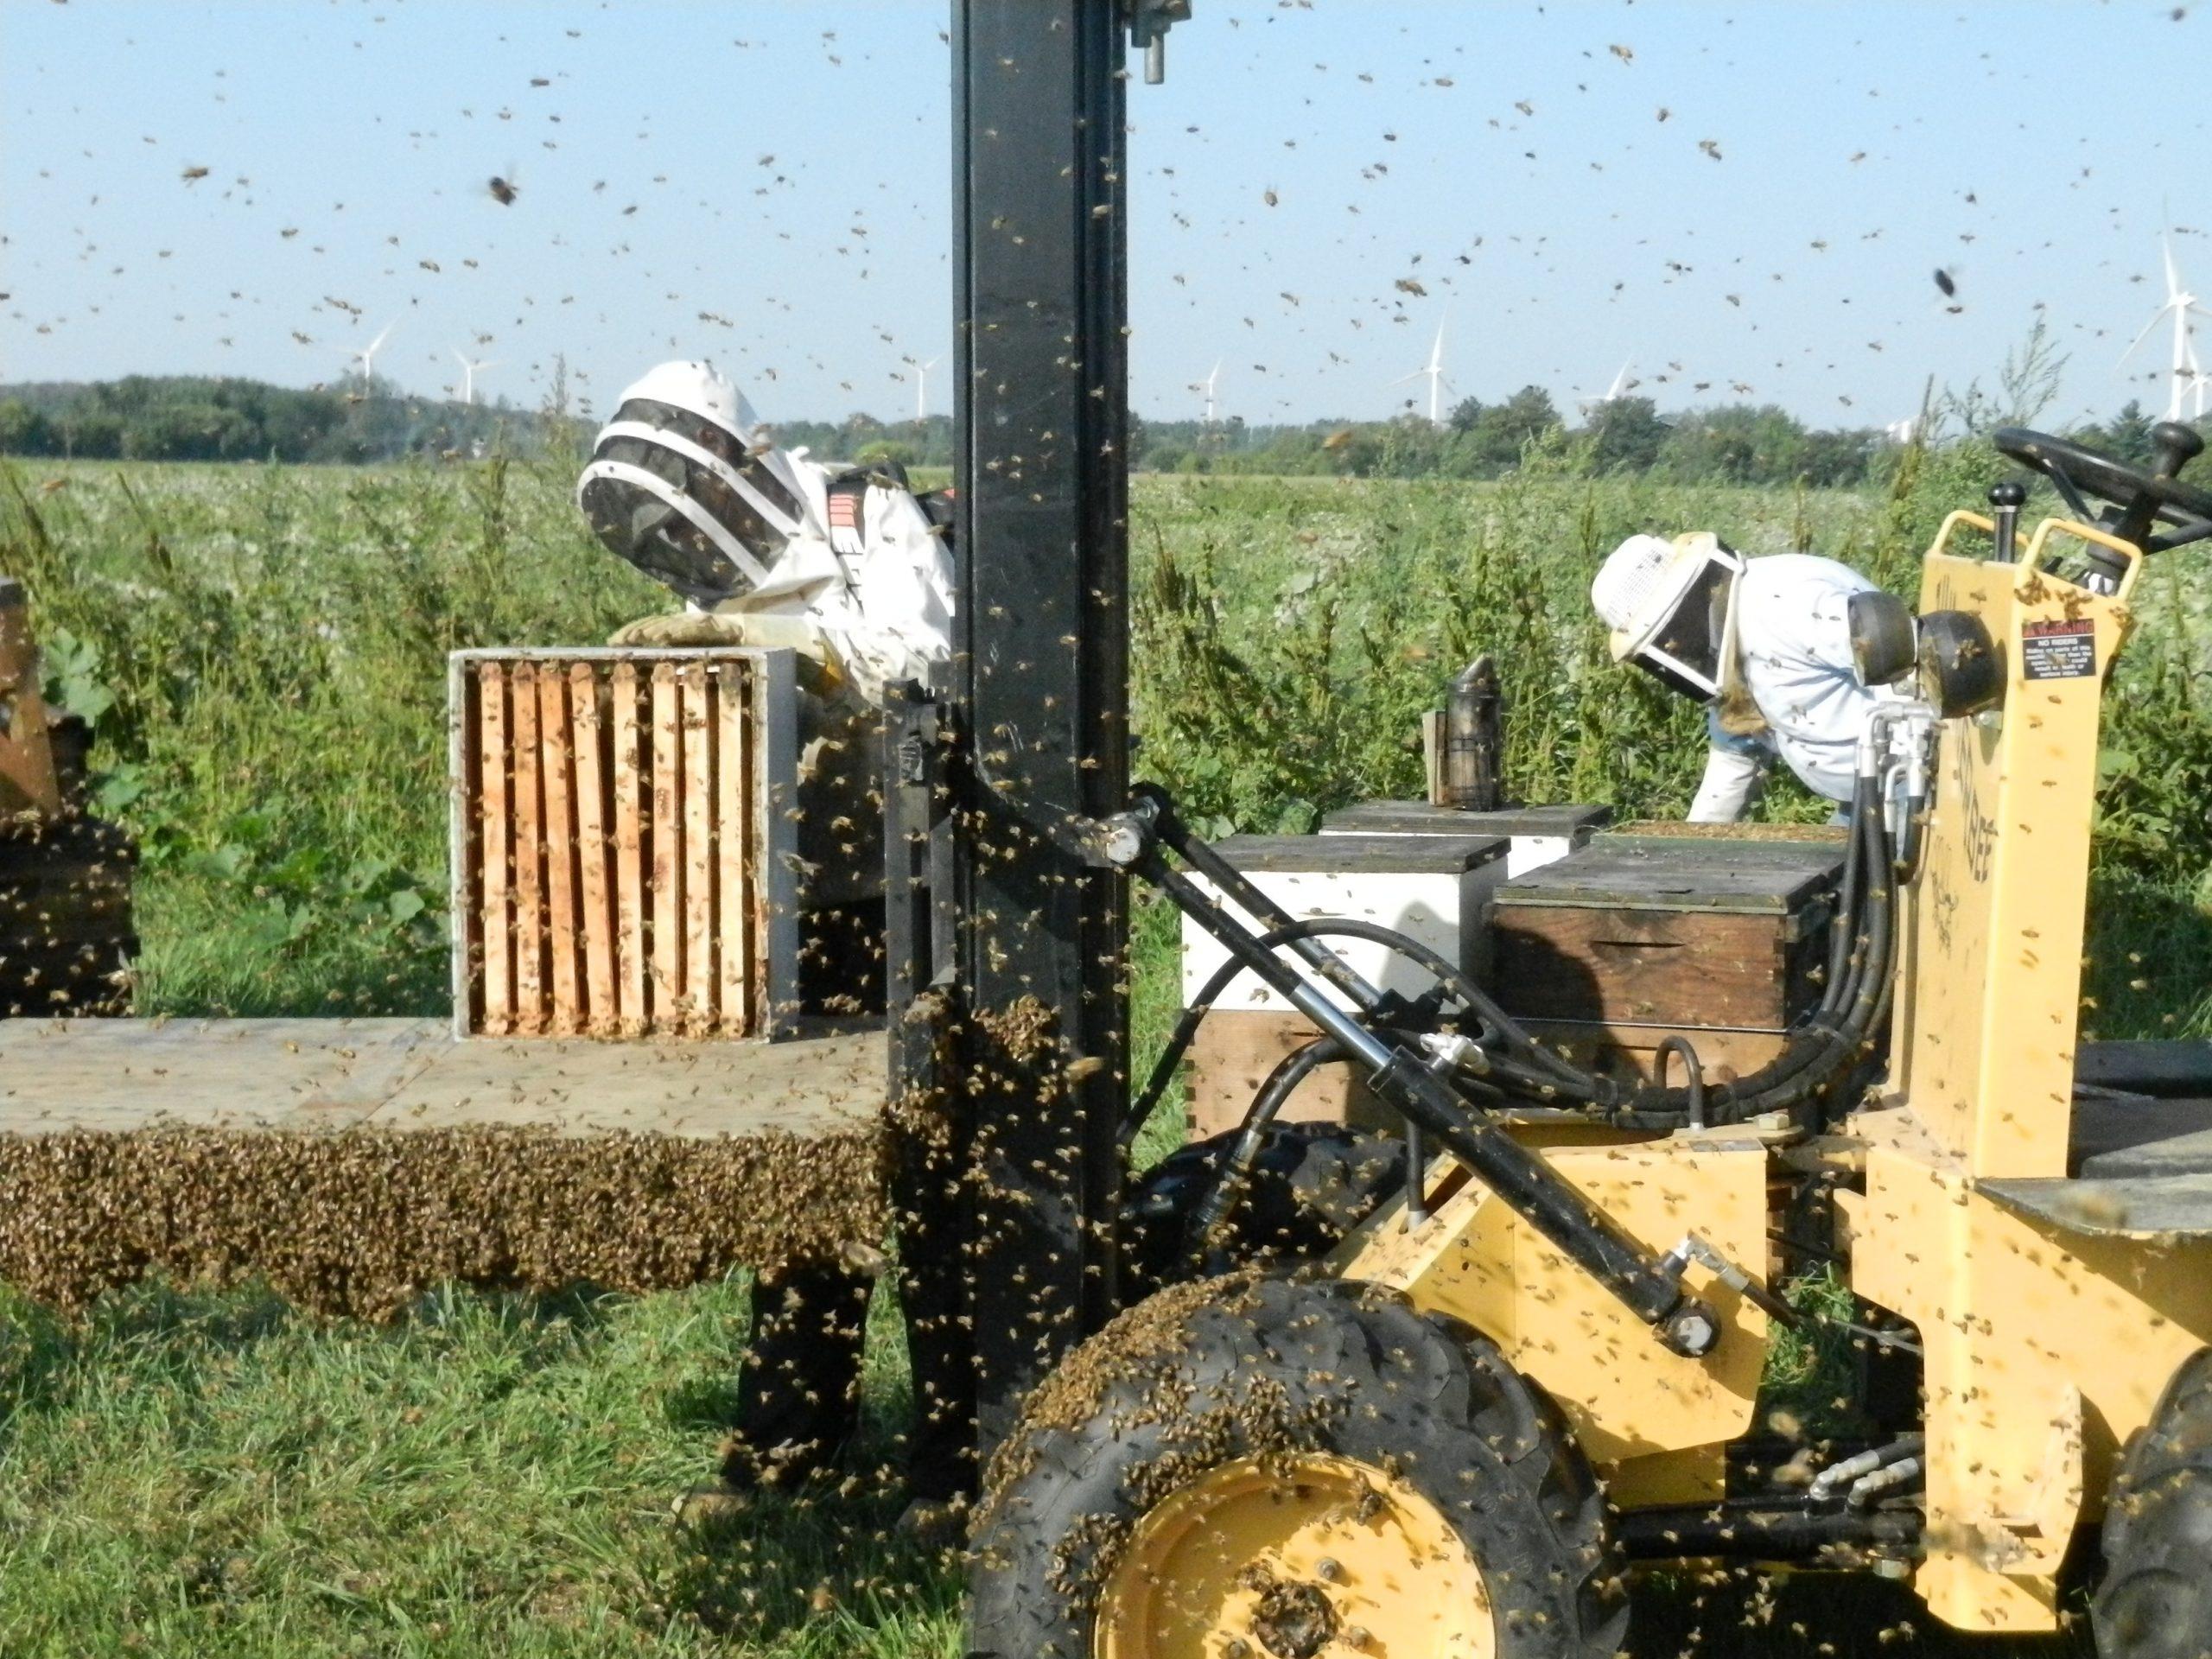 A. H. Apiaries - Beekeepers Harvesting Honey at Michigan Honey Farm